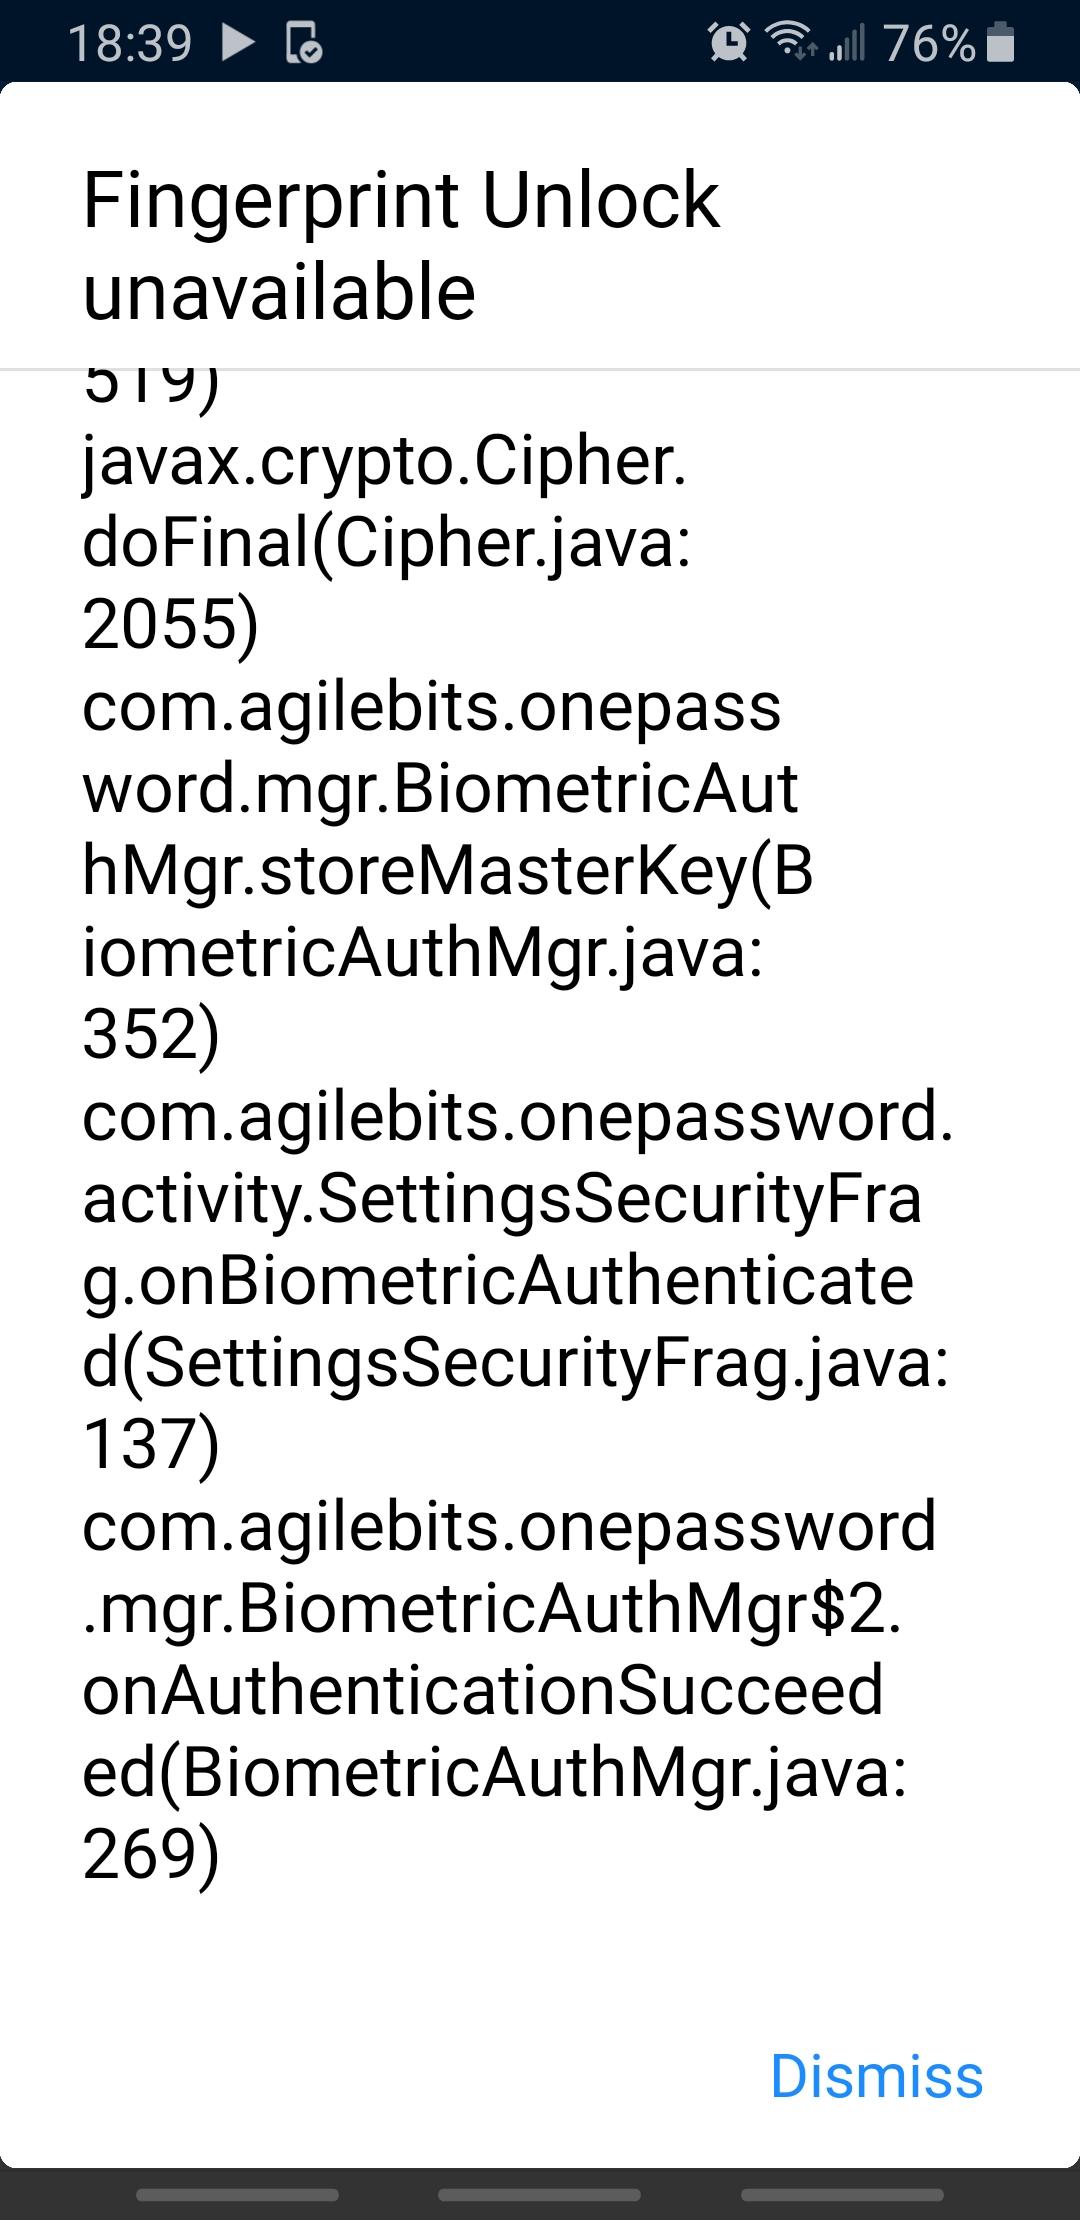 Screenshot-20191116-183944-1-Password